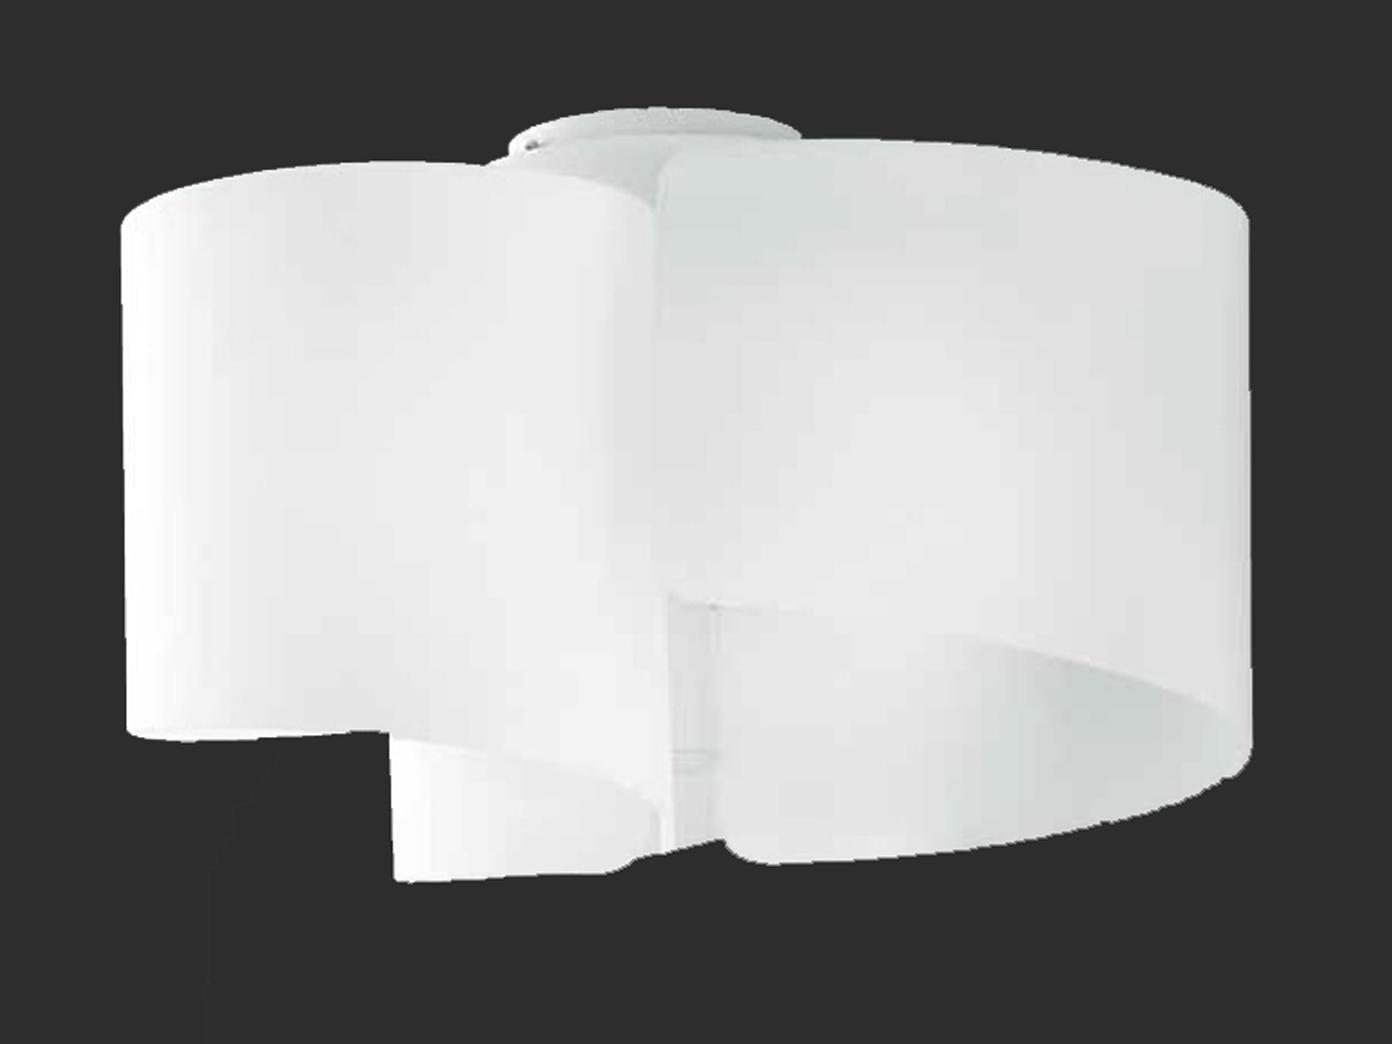 design deckenleuchte imagine lampenschirm glas wei 47cm. Black Bedroom Furniture Sets. Home Design Ideas